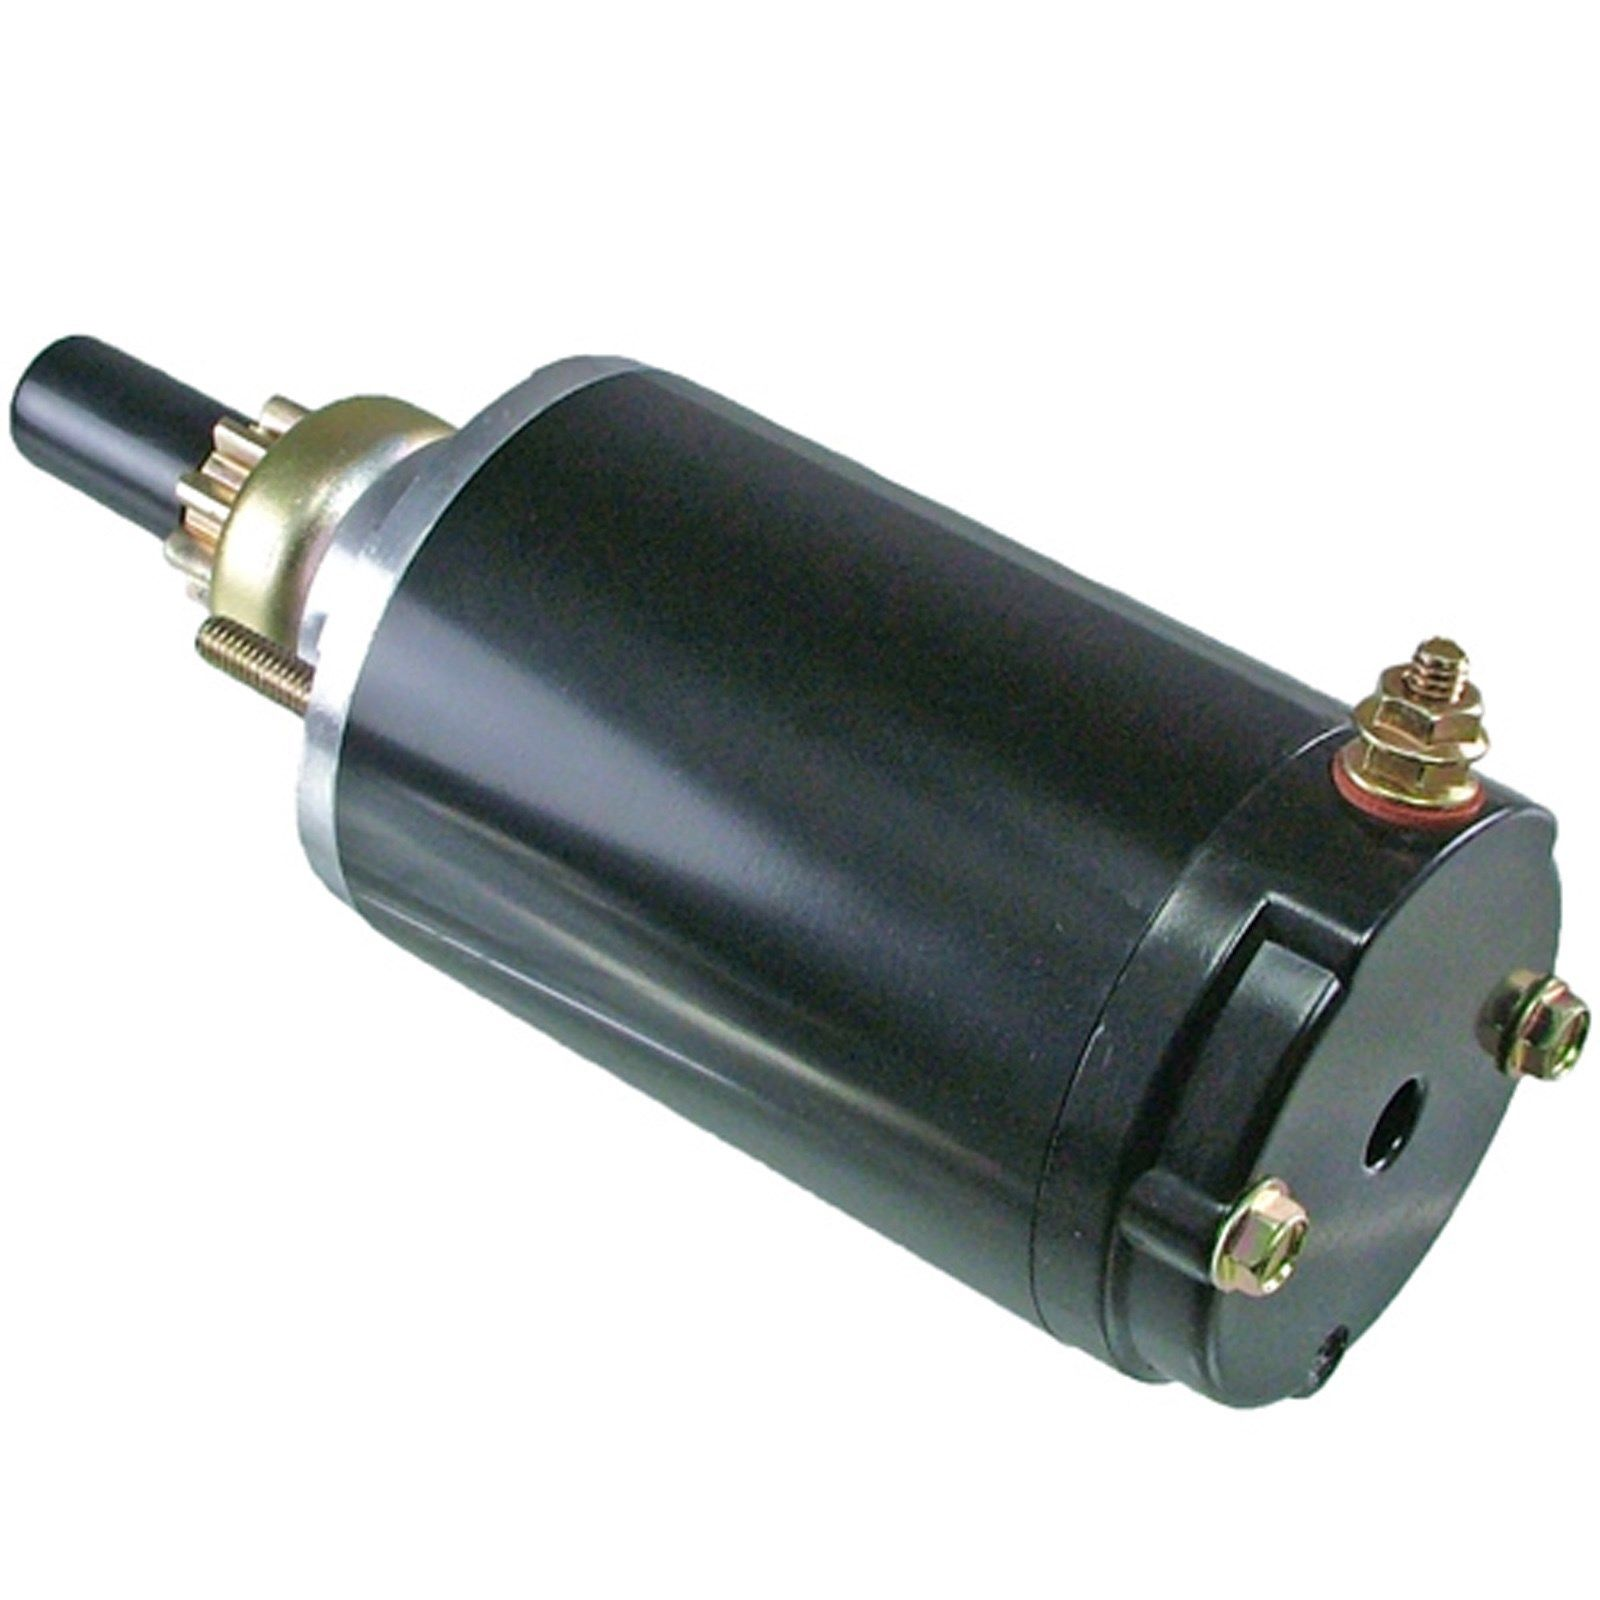 Distributor Rotor FACET 3.7628 fits 95-97 Geo Metro 1.3L-L4